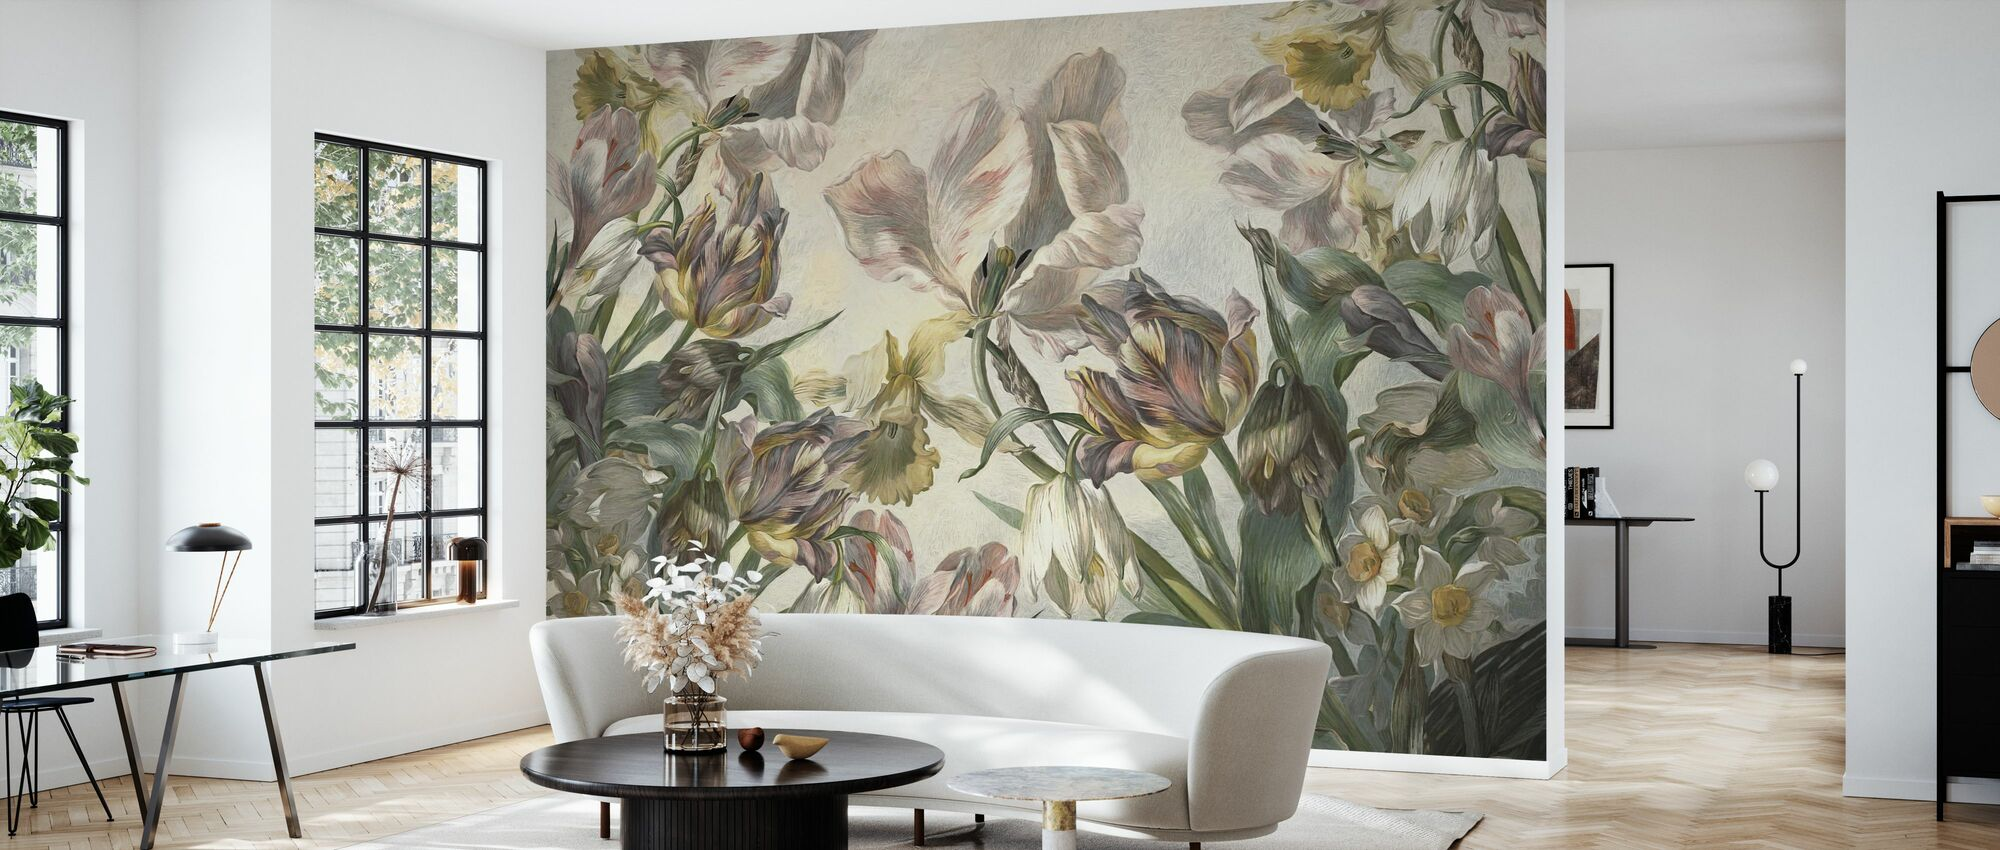 Bohemian Tulips - Wallpaper - Living Room